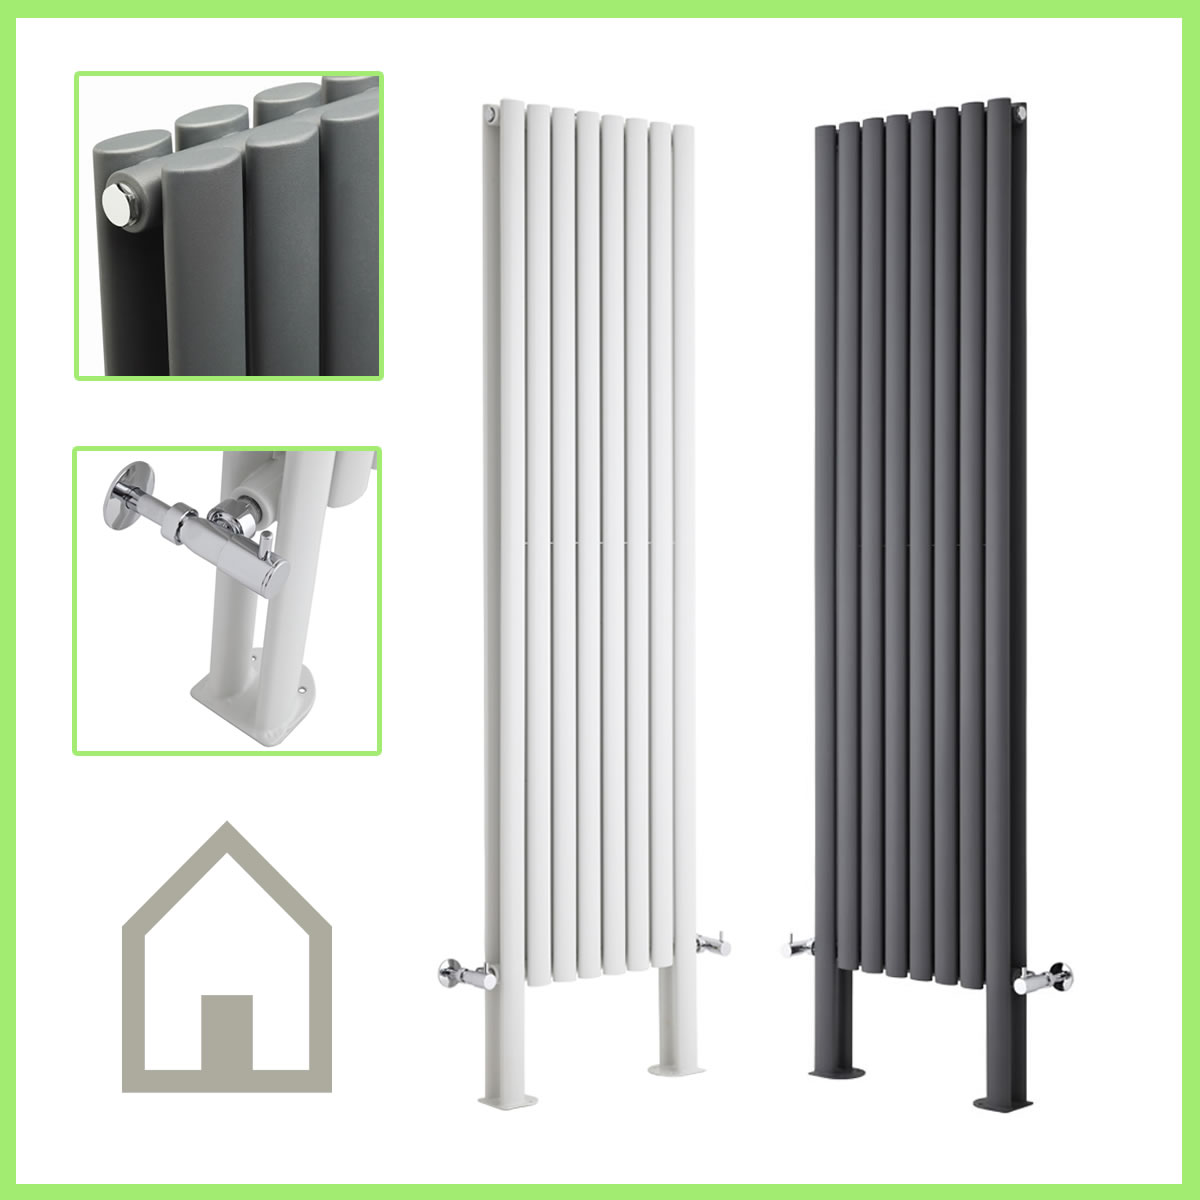 Vertical DESIGNER Radiator Oval Column Tall Upright Central Heating ...